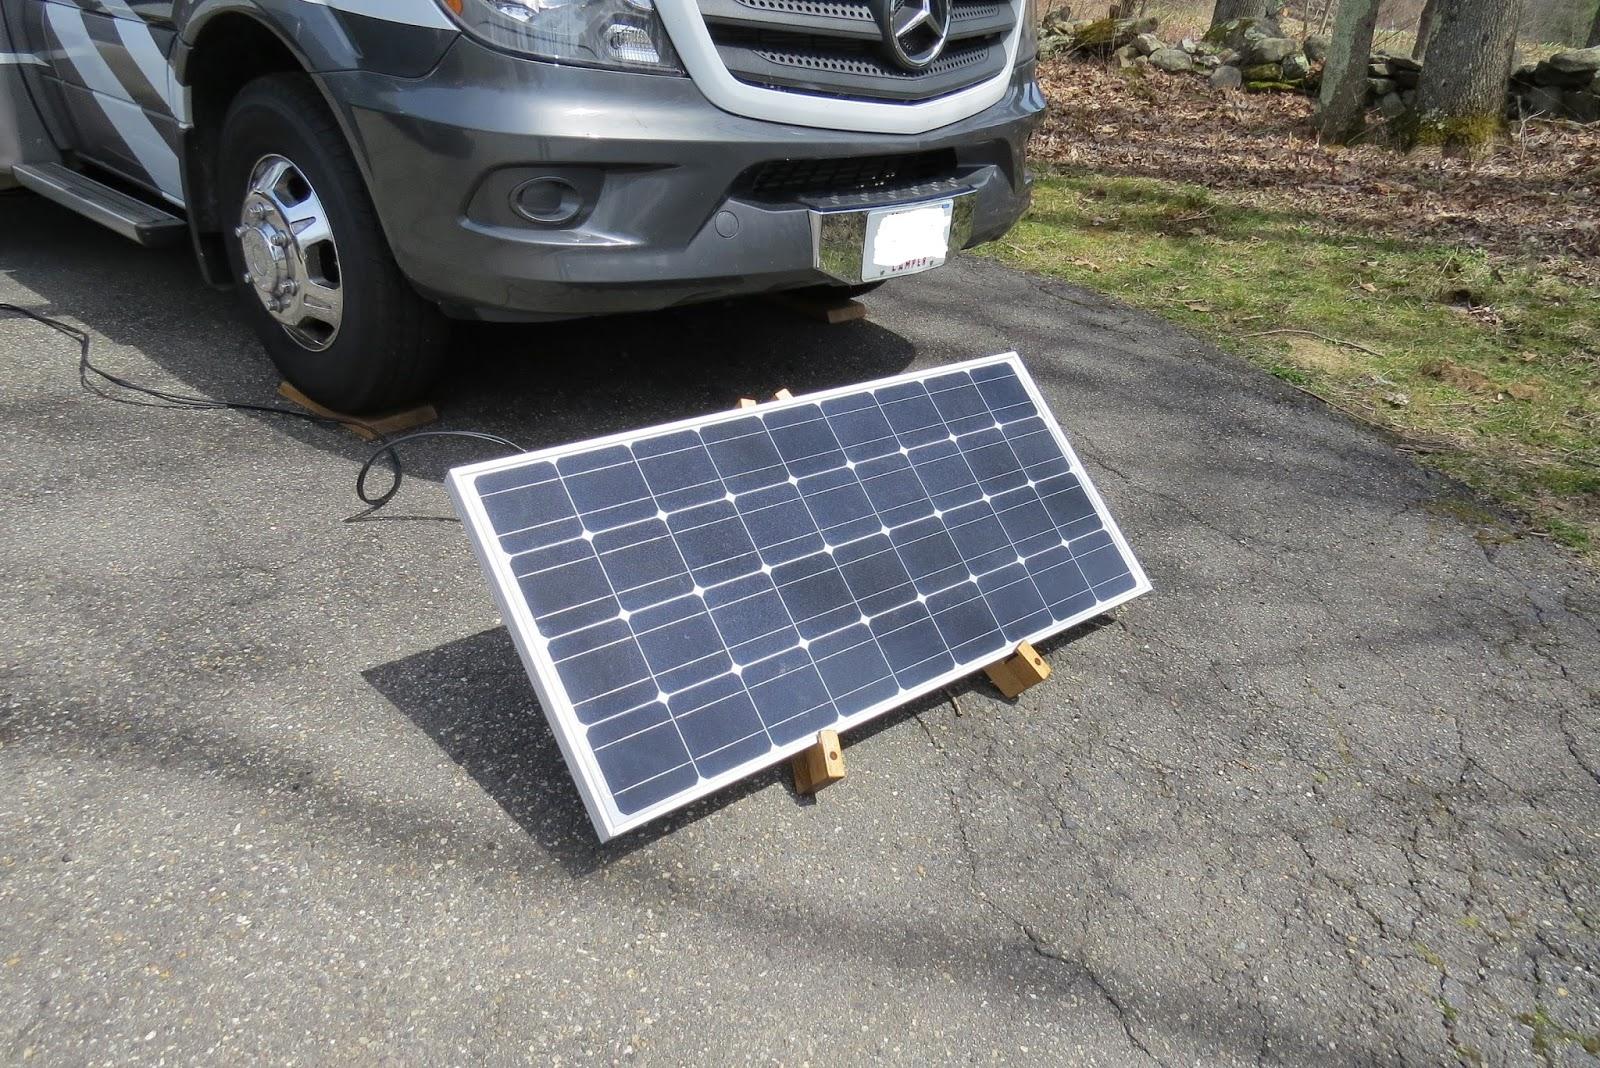 rv solar john deere g tractor for sale diy install j dawg journeys fmca forums